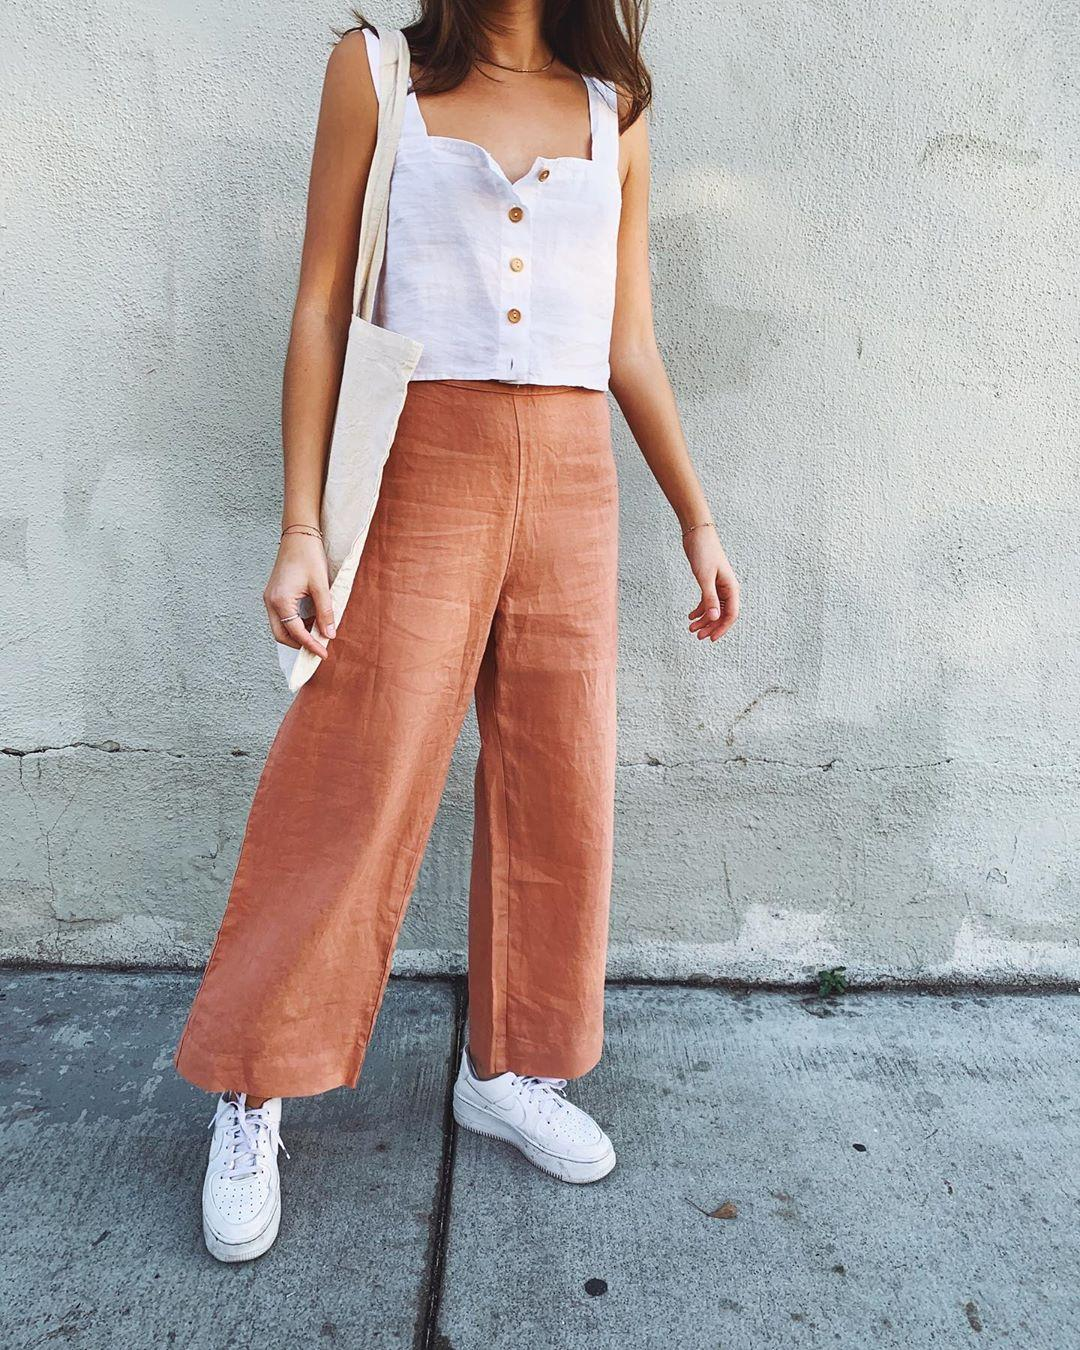 top pants